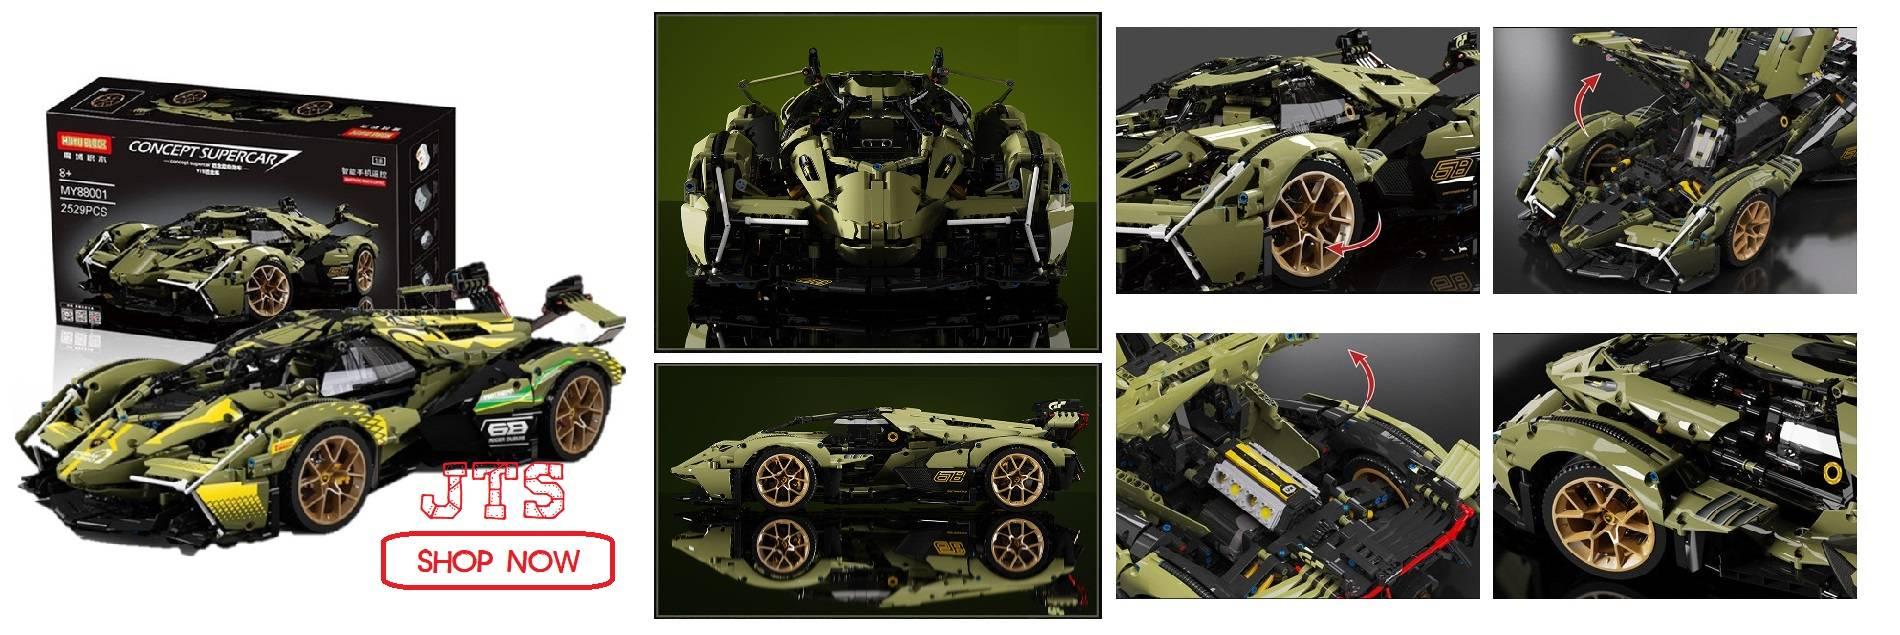 MOYU BLOCK Lamborghini V12 88001